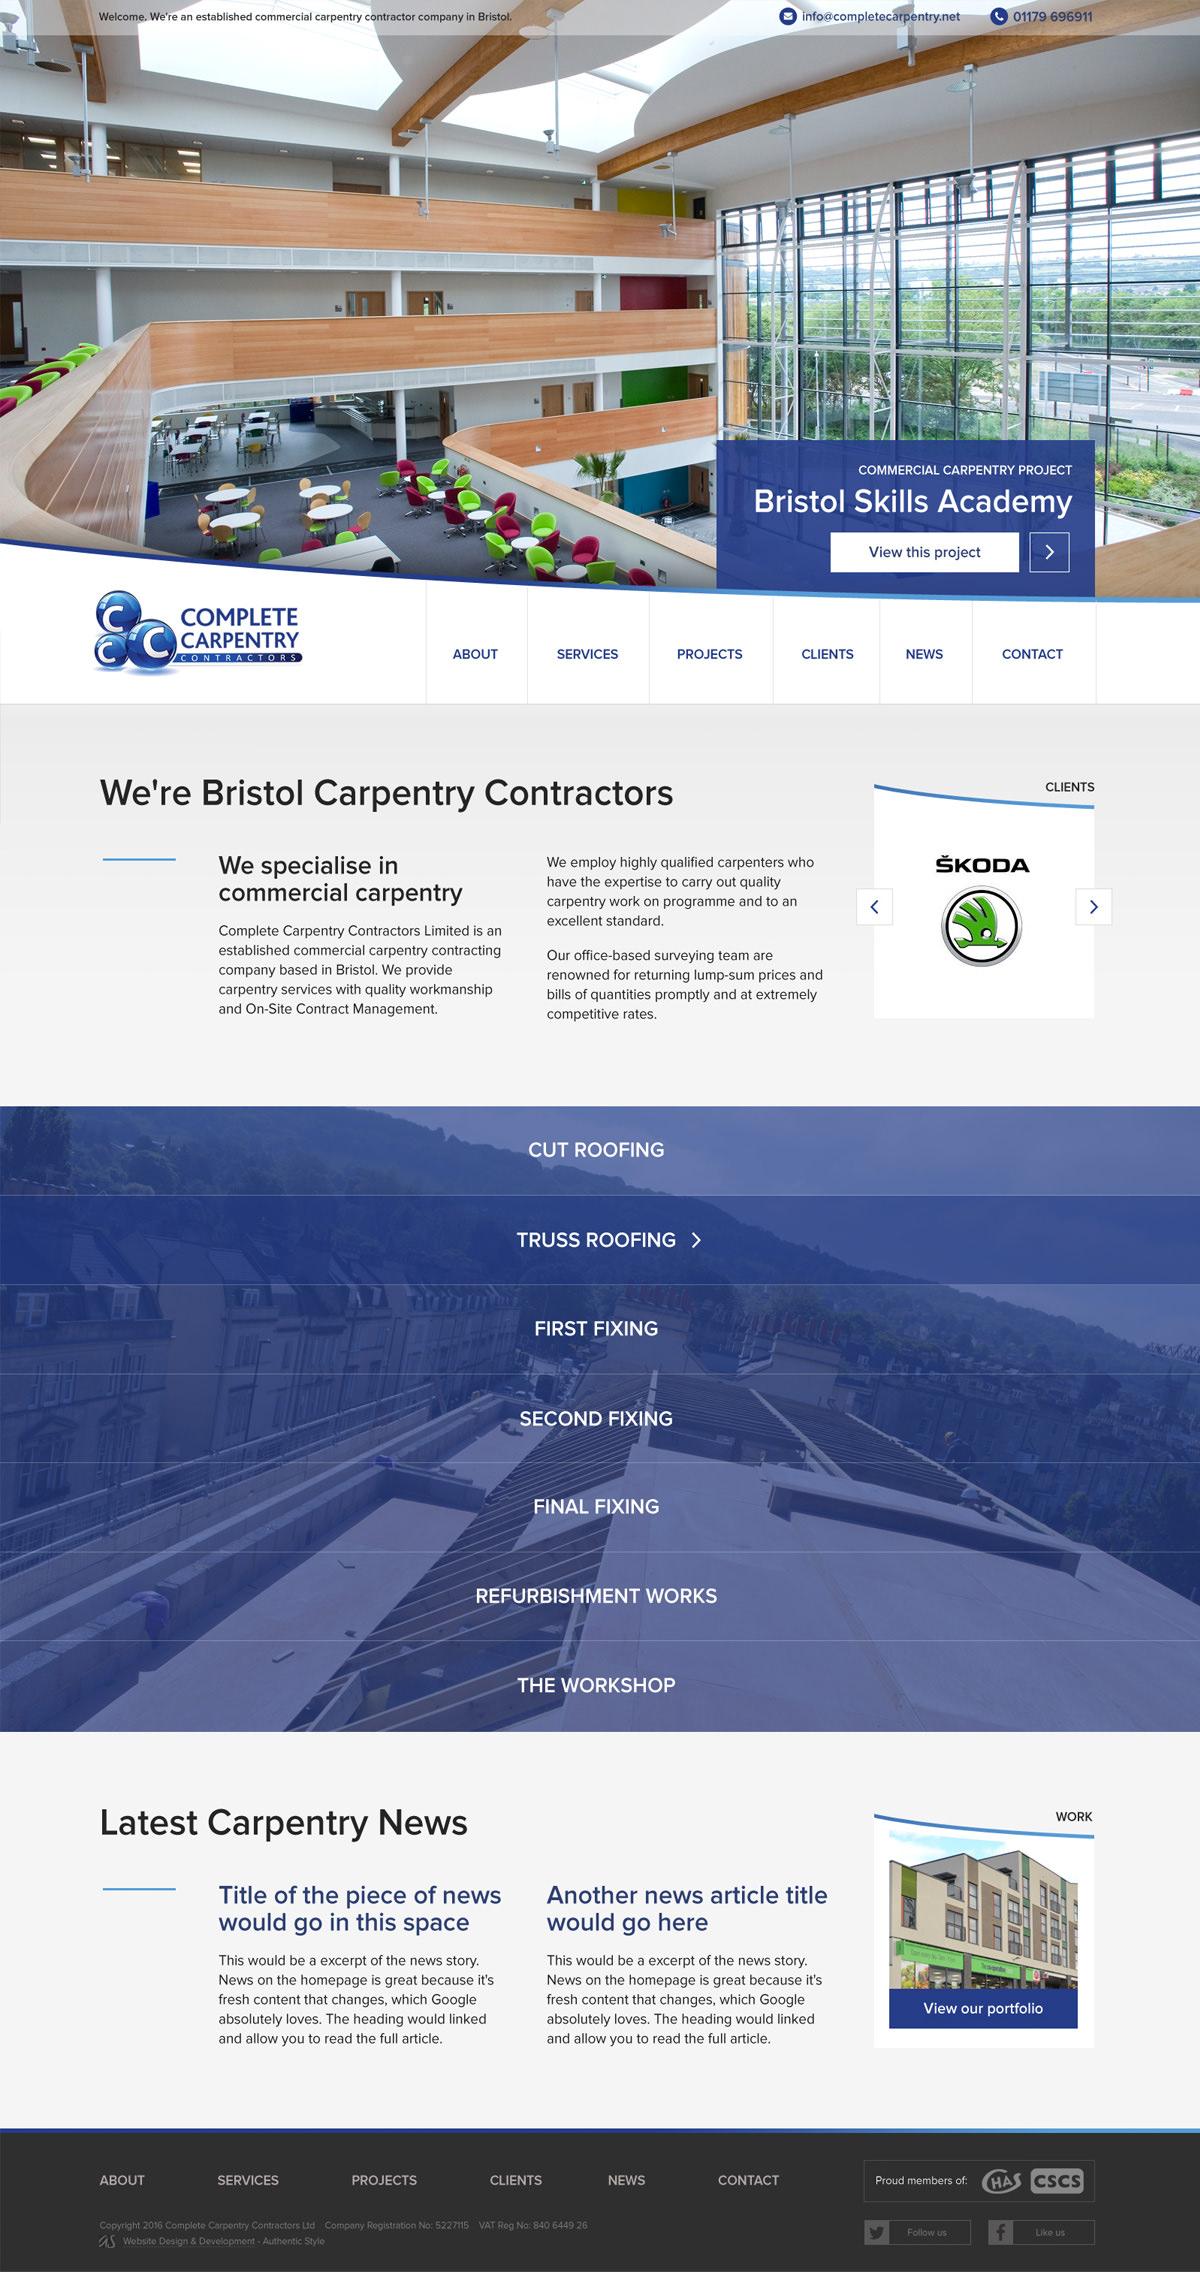 carpentry-contracors-bristol-new-website-design